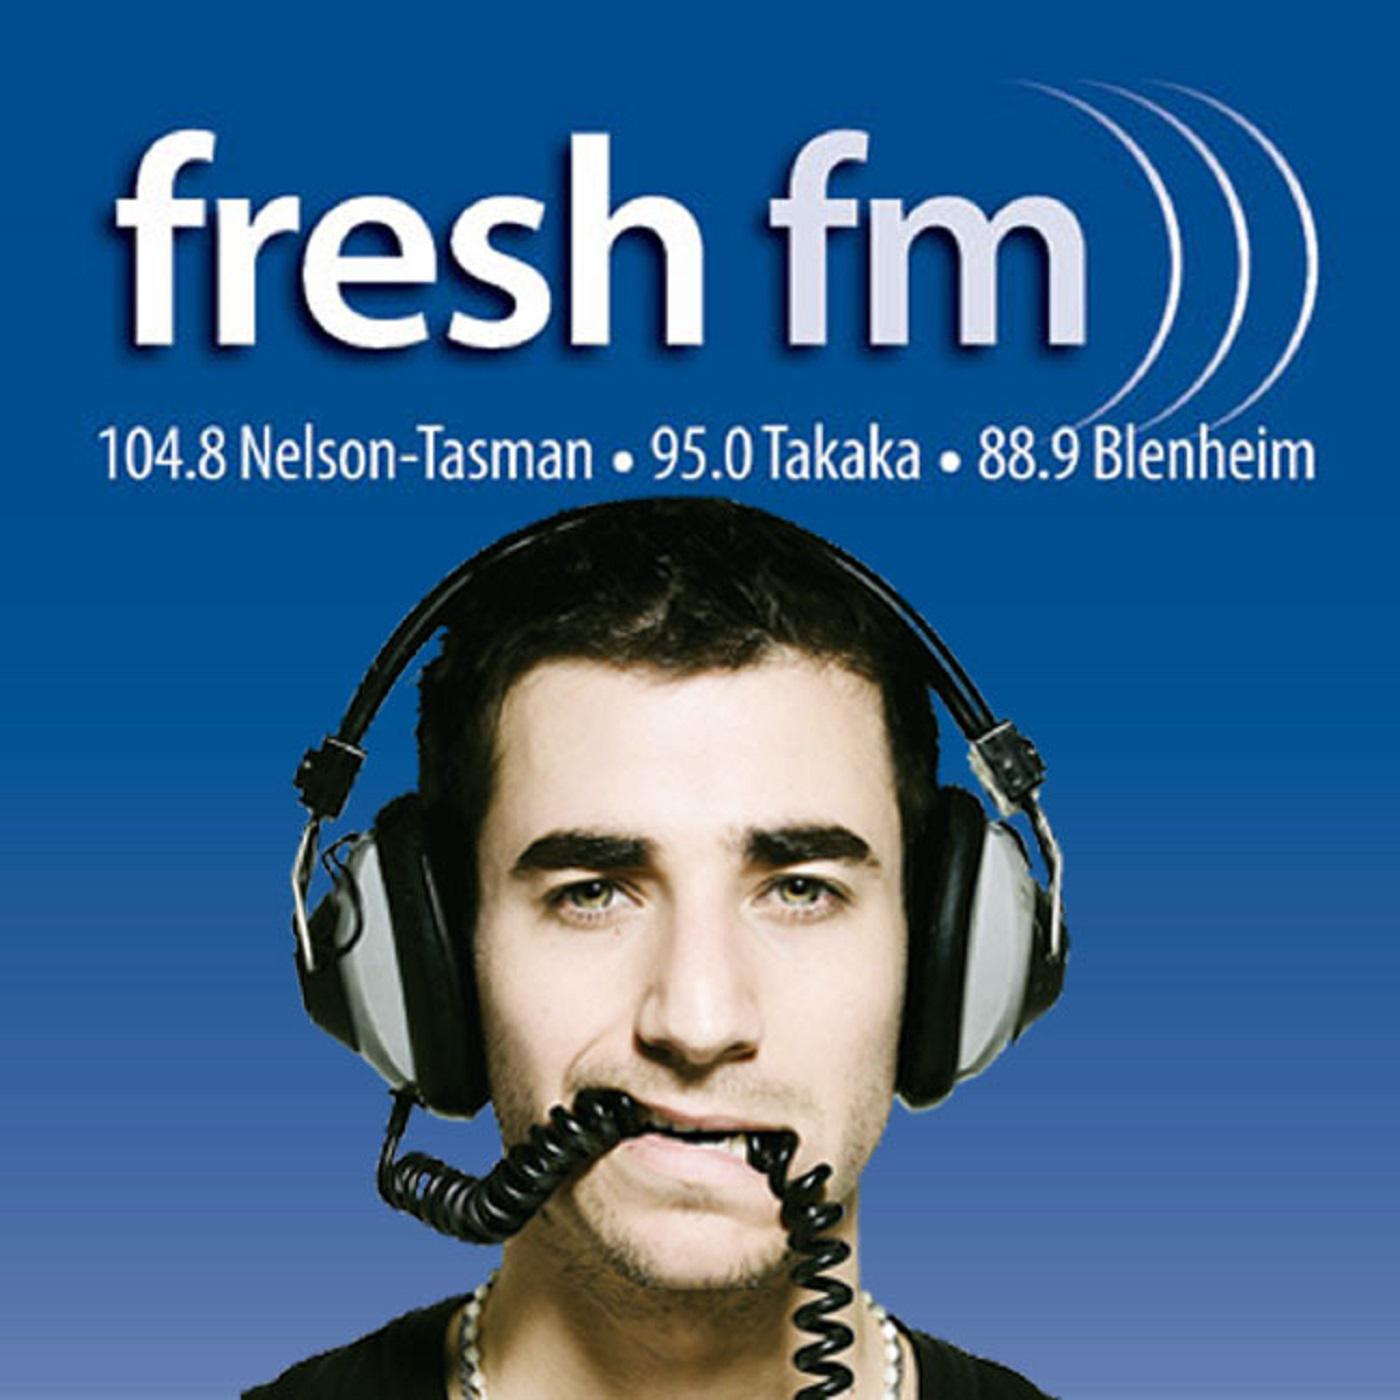 https://cdn.accessradio.org/StationFolder/freshfm/Images/Fresh-FM-Art140089.png